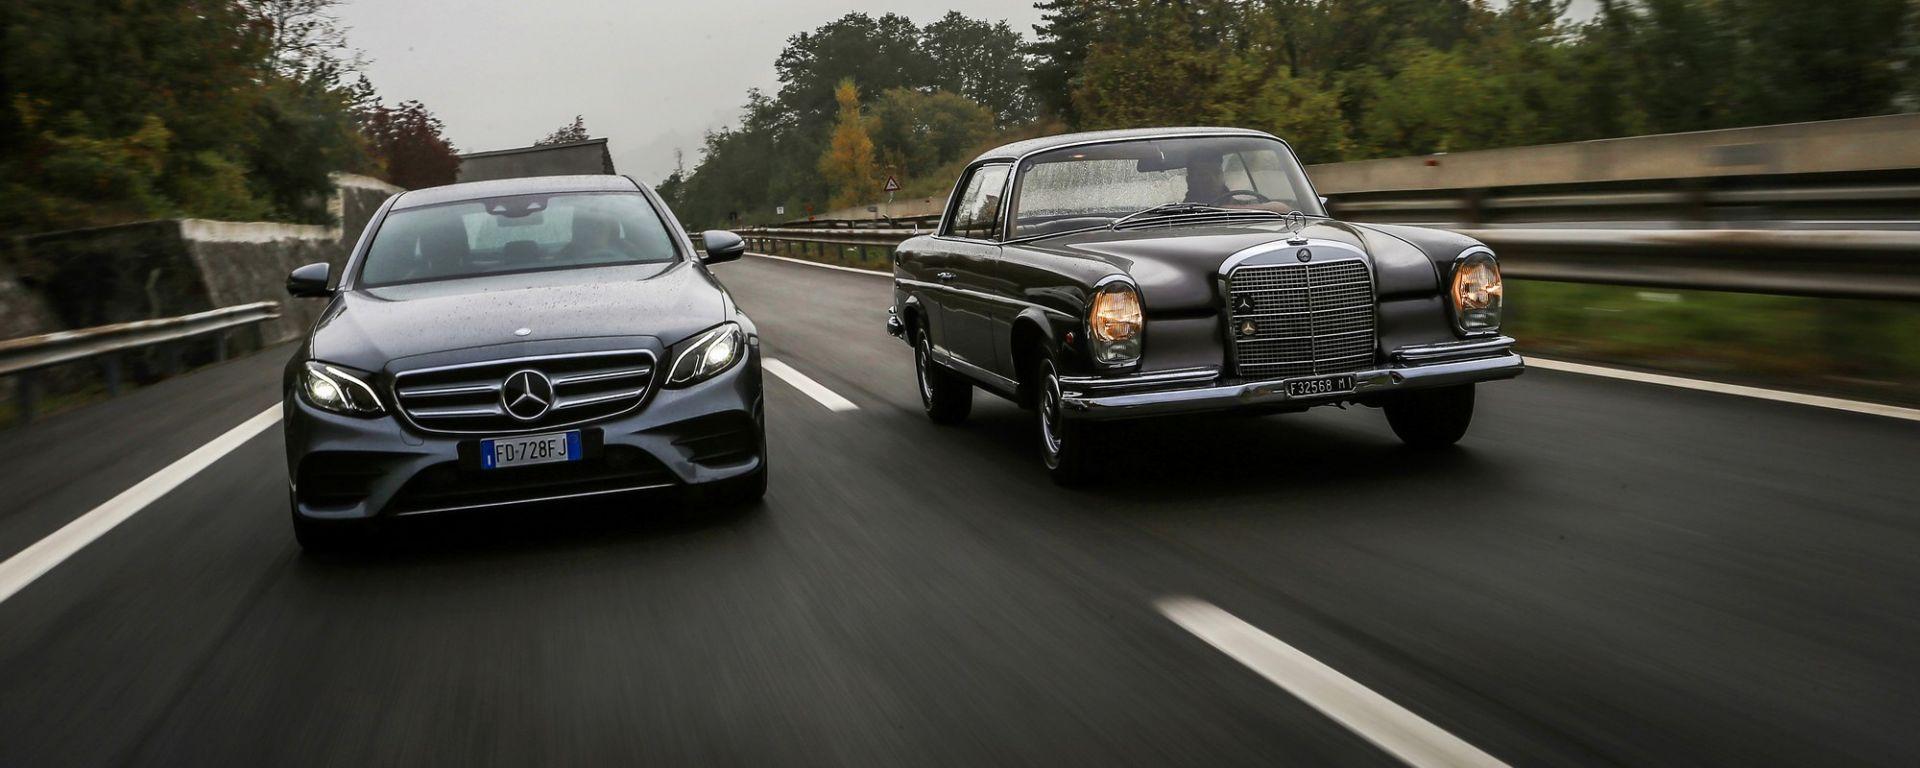 Mercedes: Classe E wagon vs 280 SE vs 190 E vs 200 E